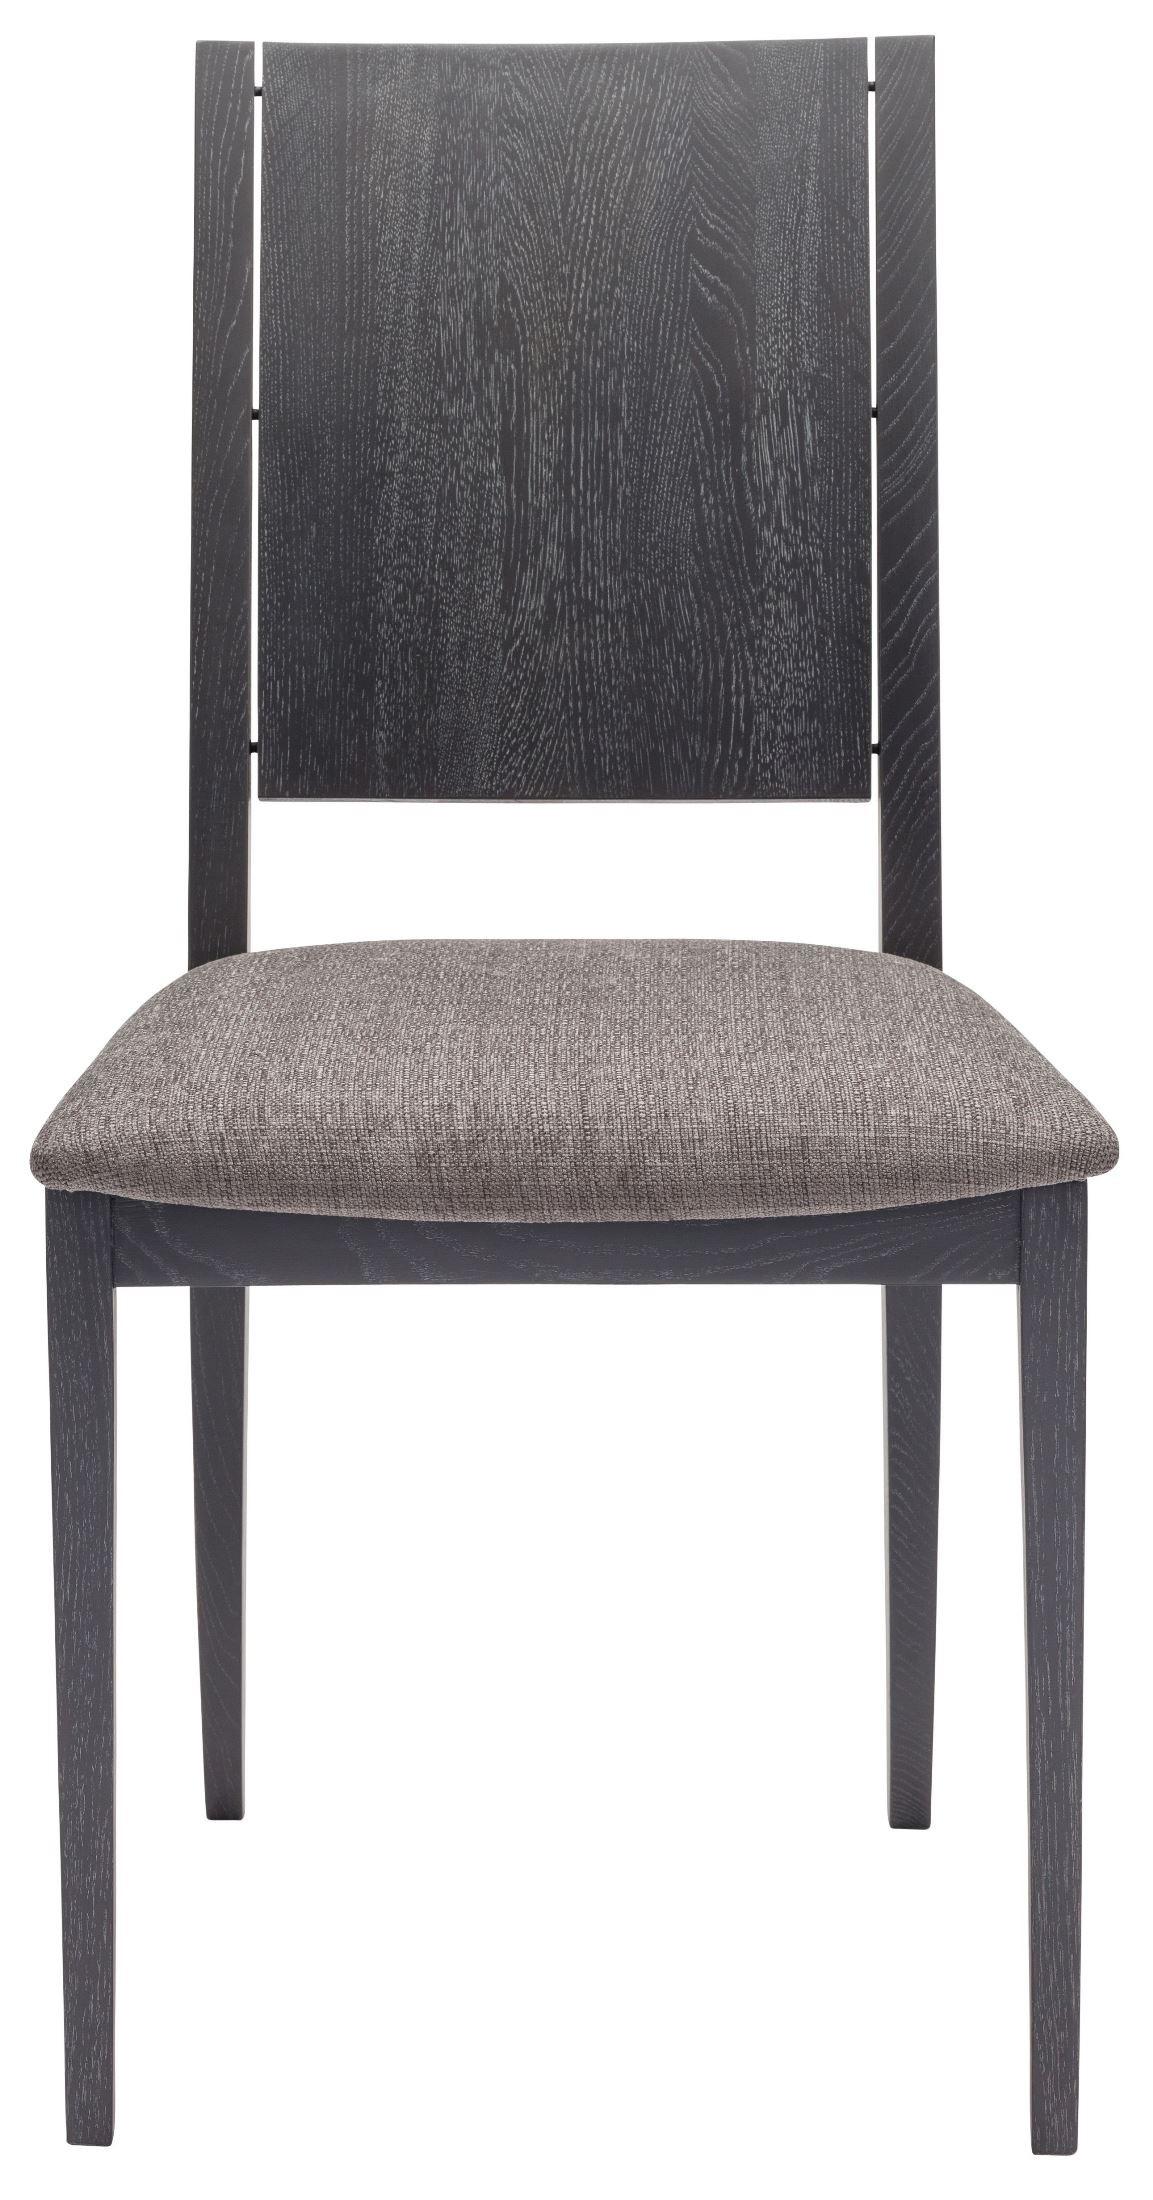 Eska Dark Grey Fabric Dining Chair HGSR580 Nuevo